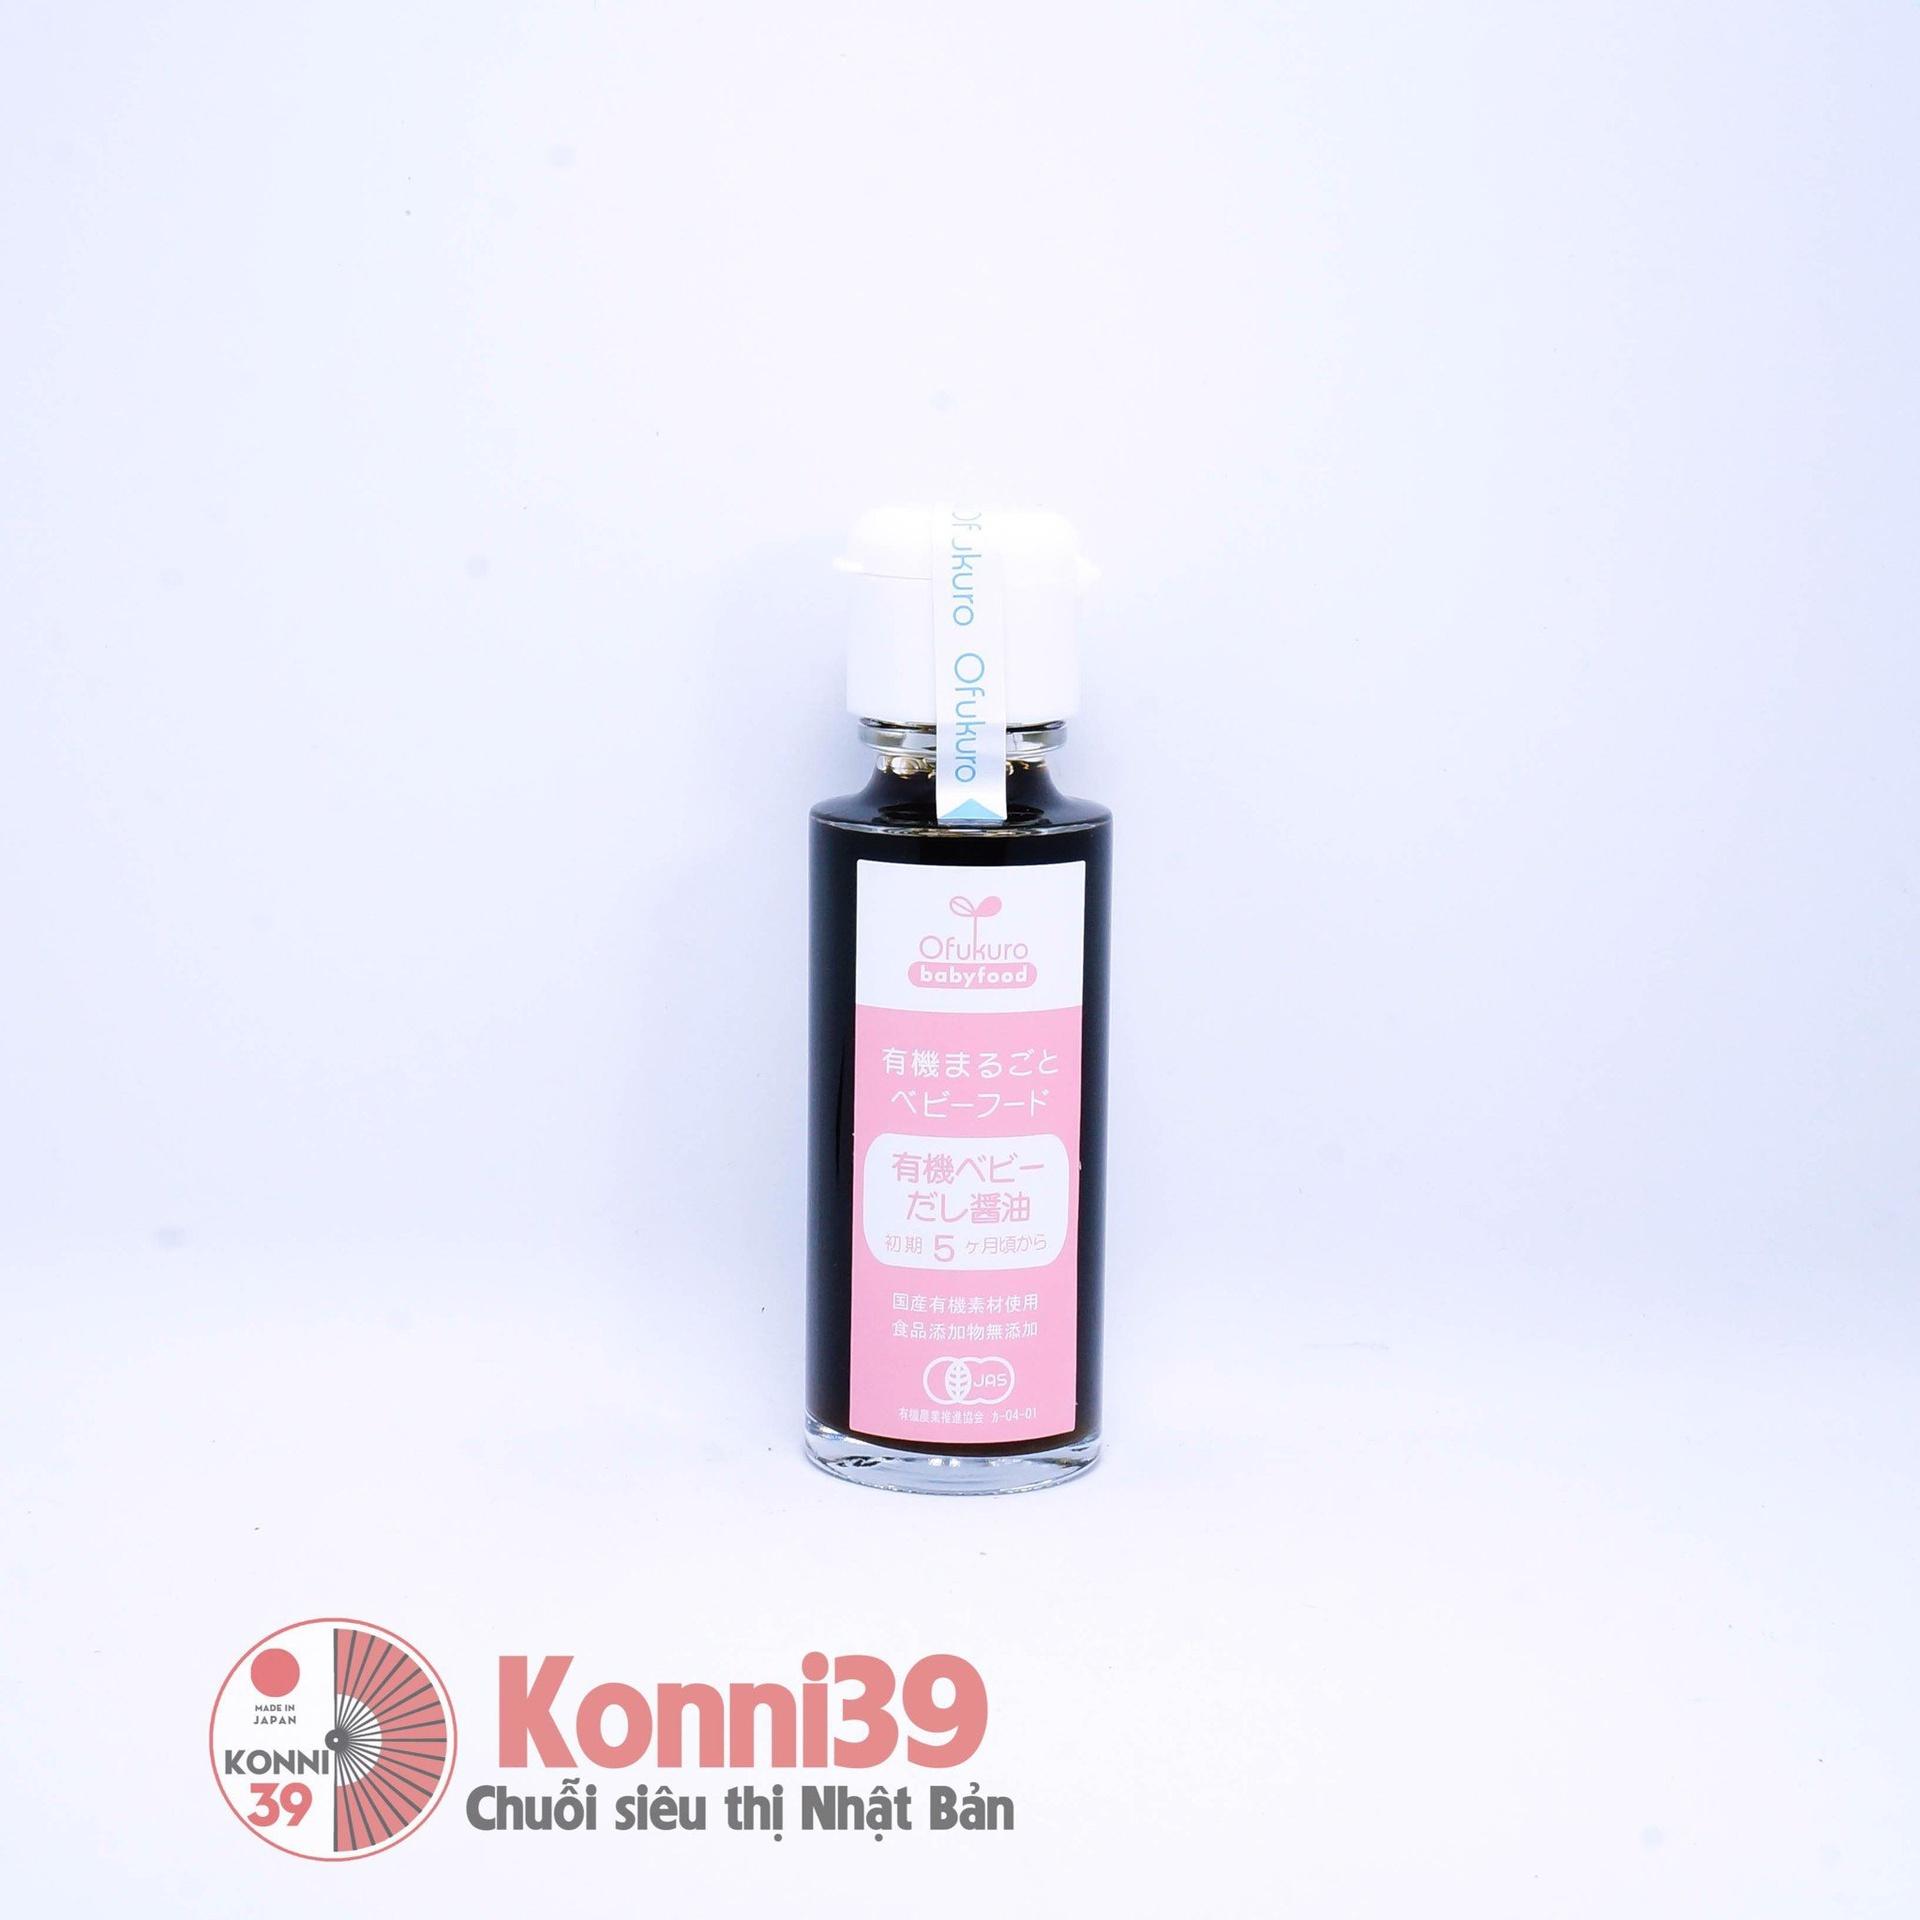 nuoc-tuong-ofukuro-chai-100g